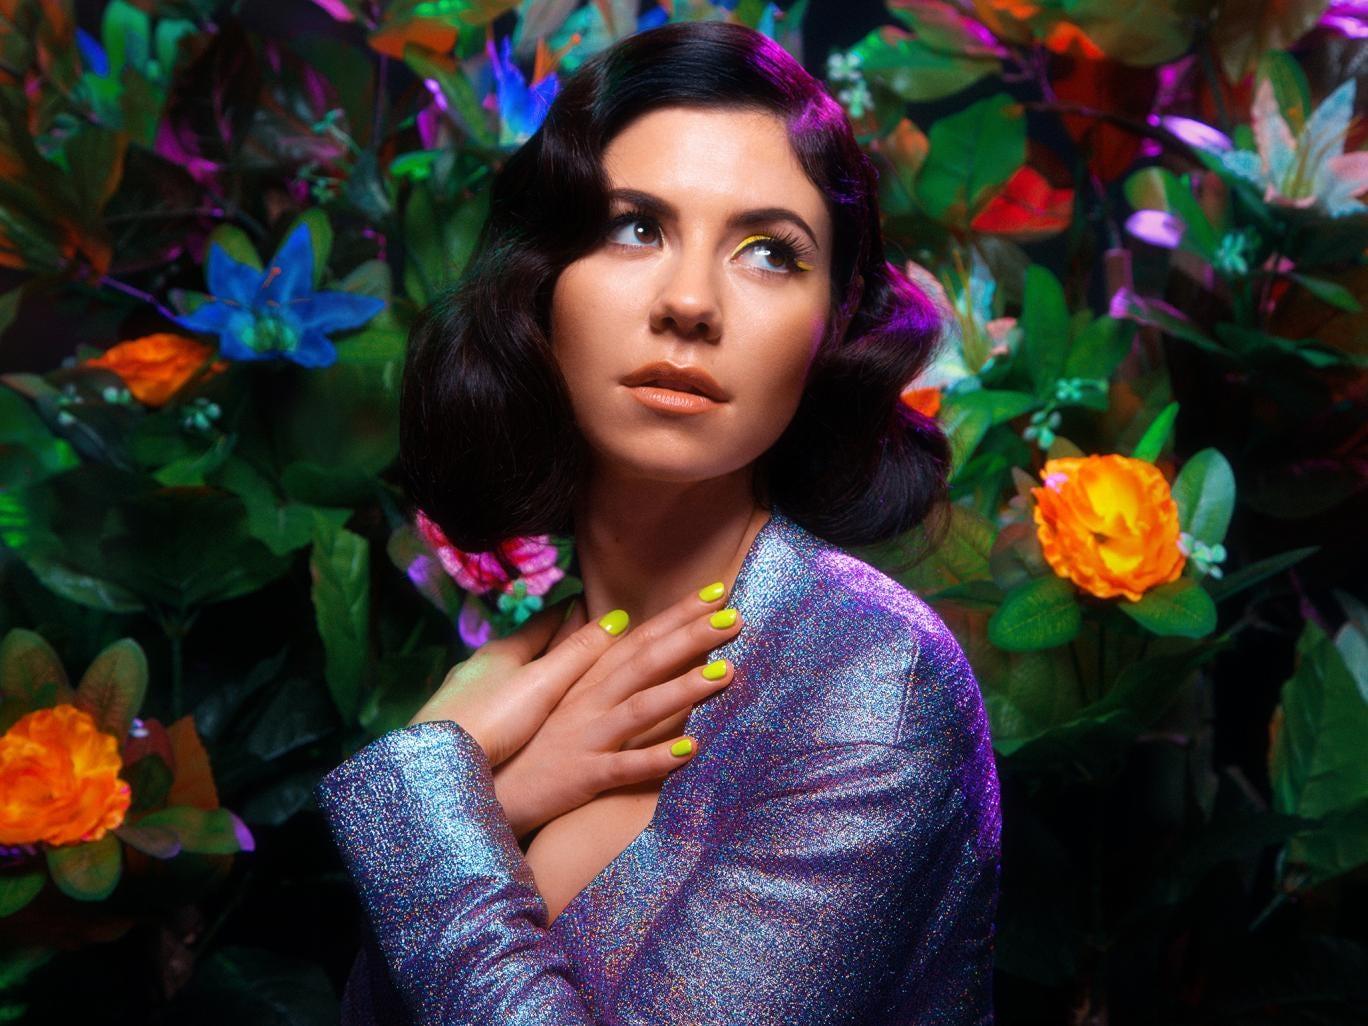 Marina and the Diamonds - Wikipedia